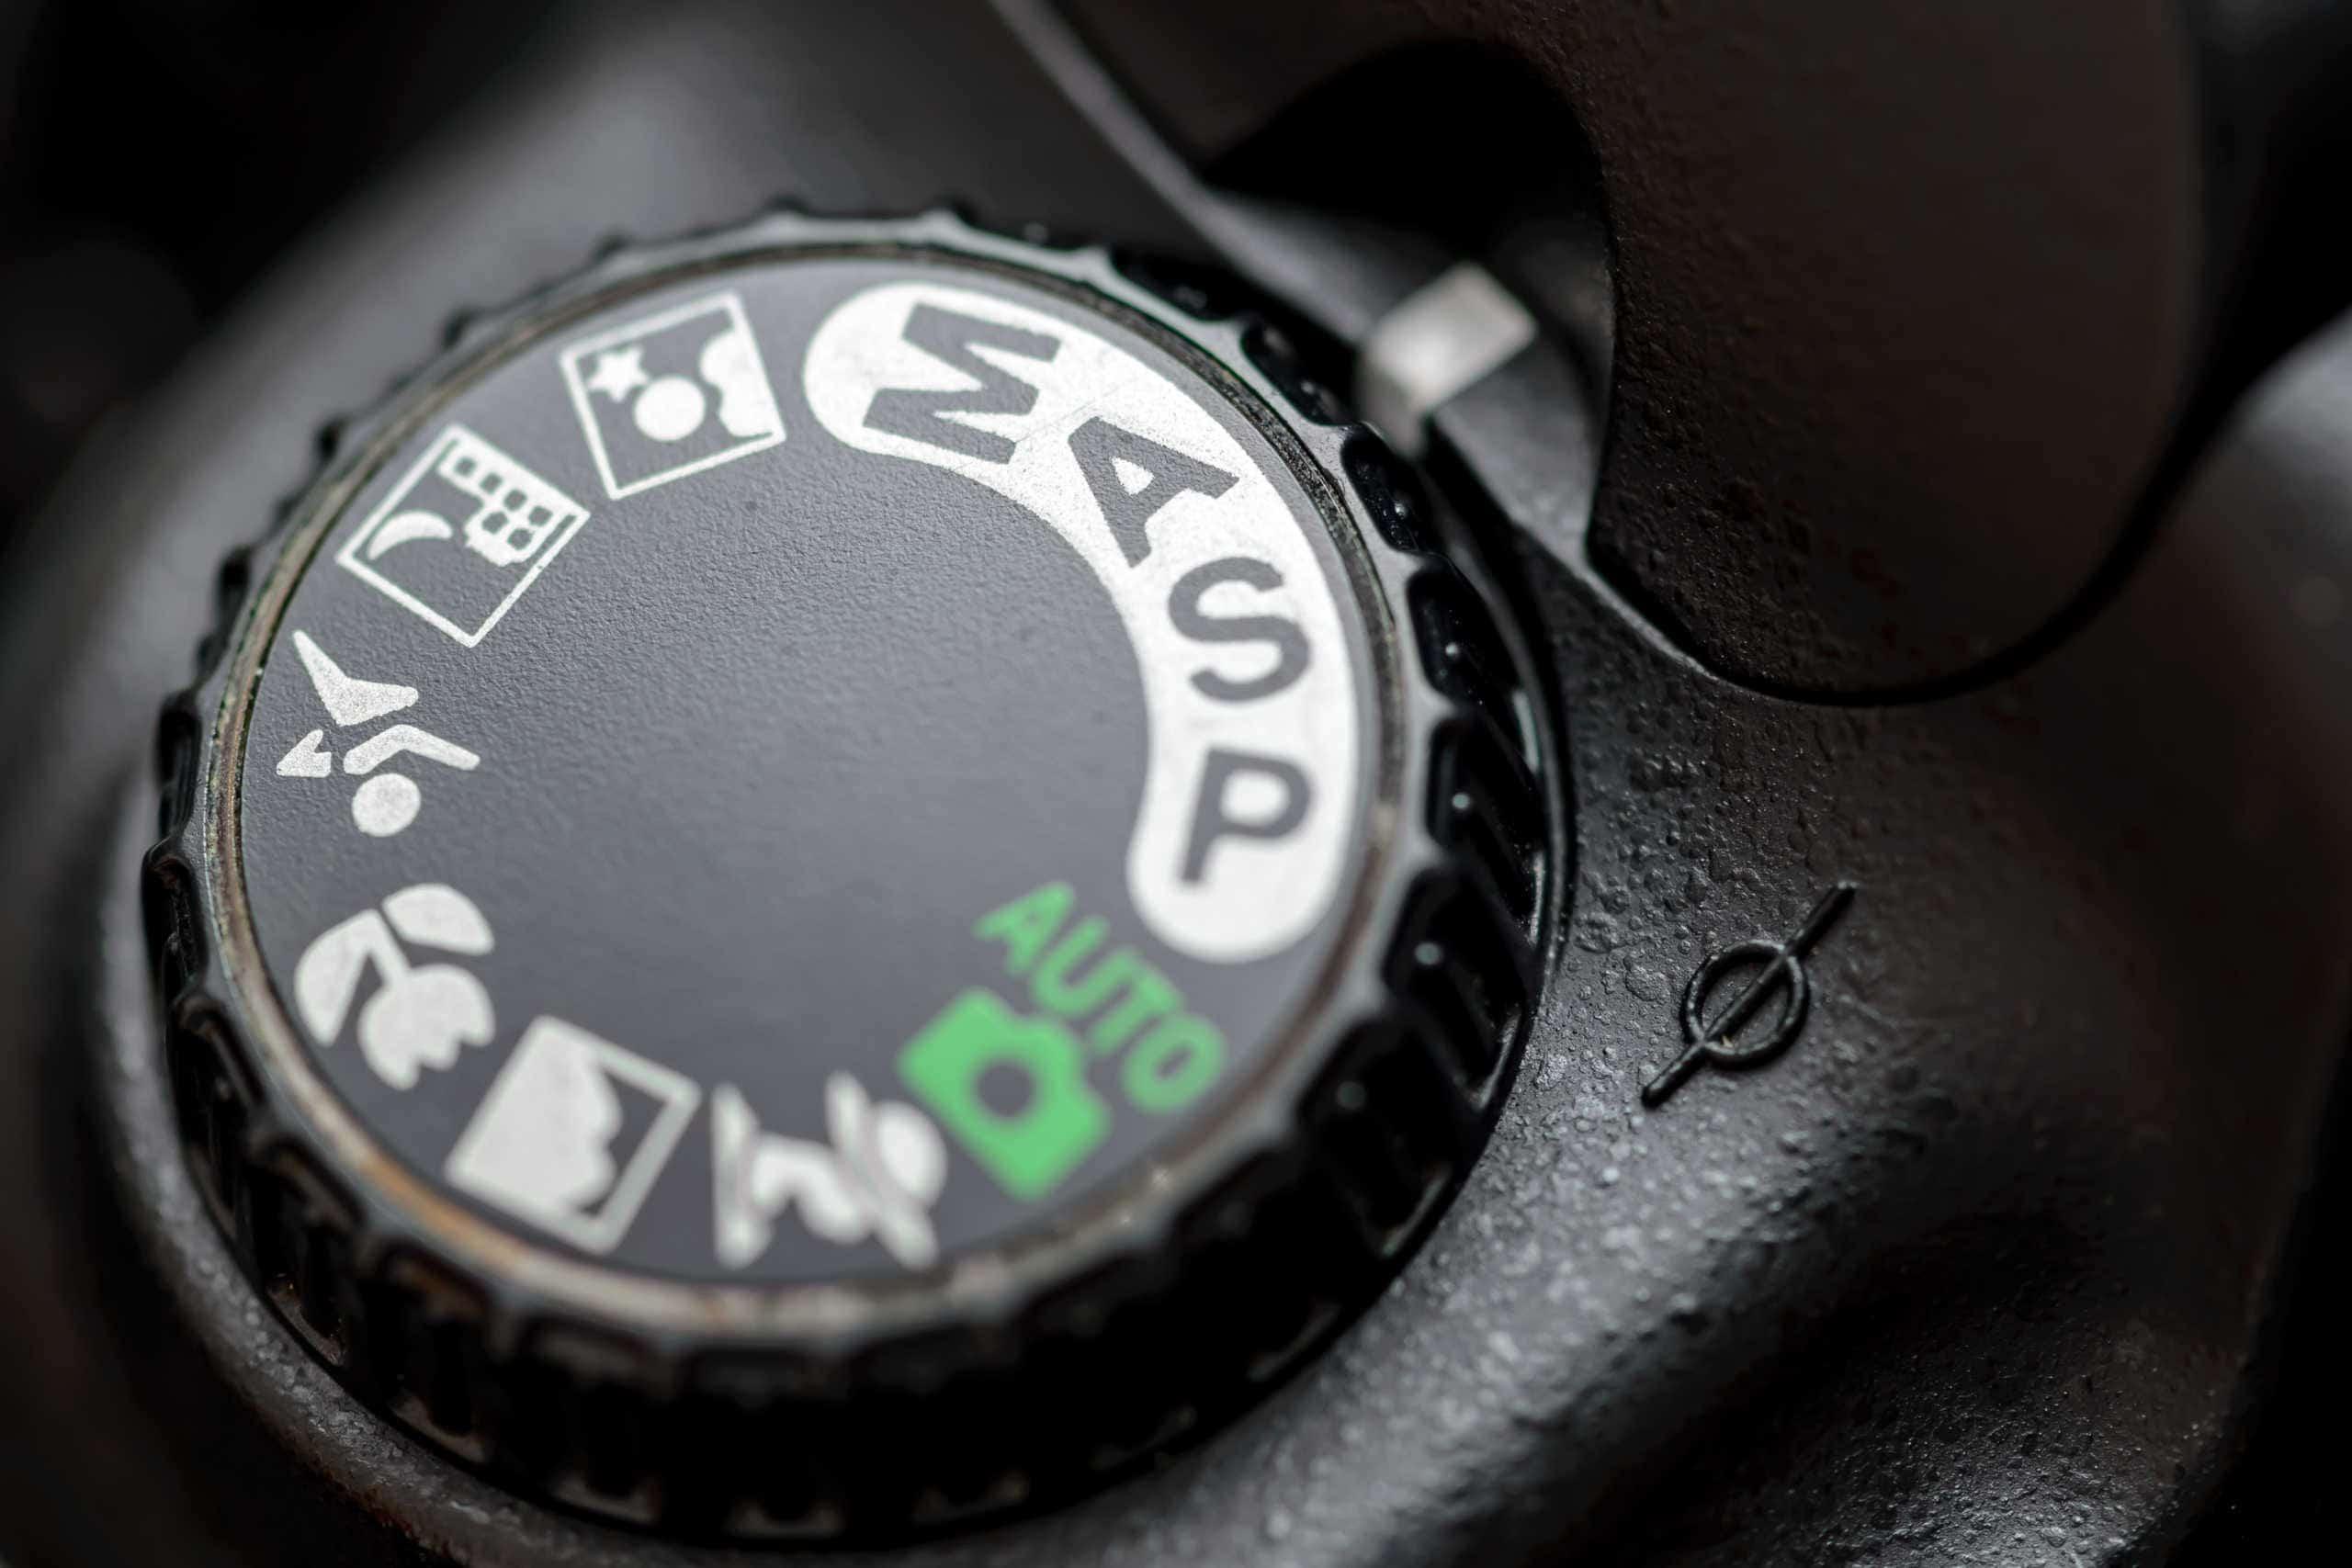 nikon camera on the aperture priority mode